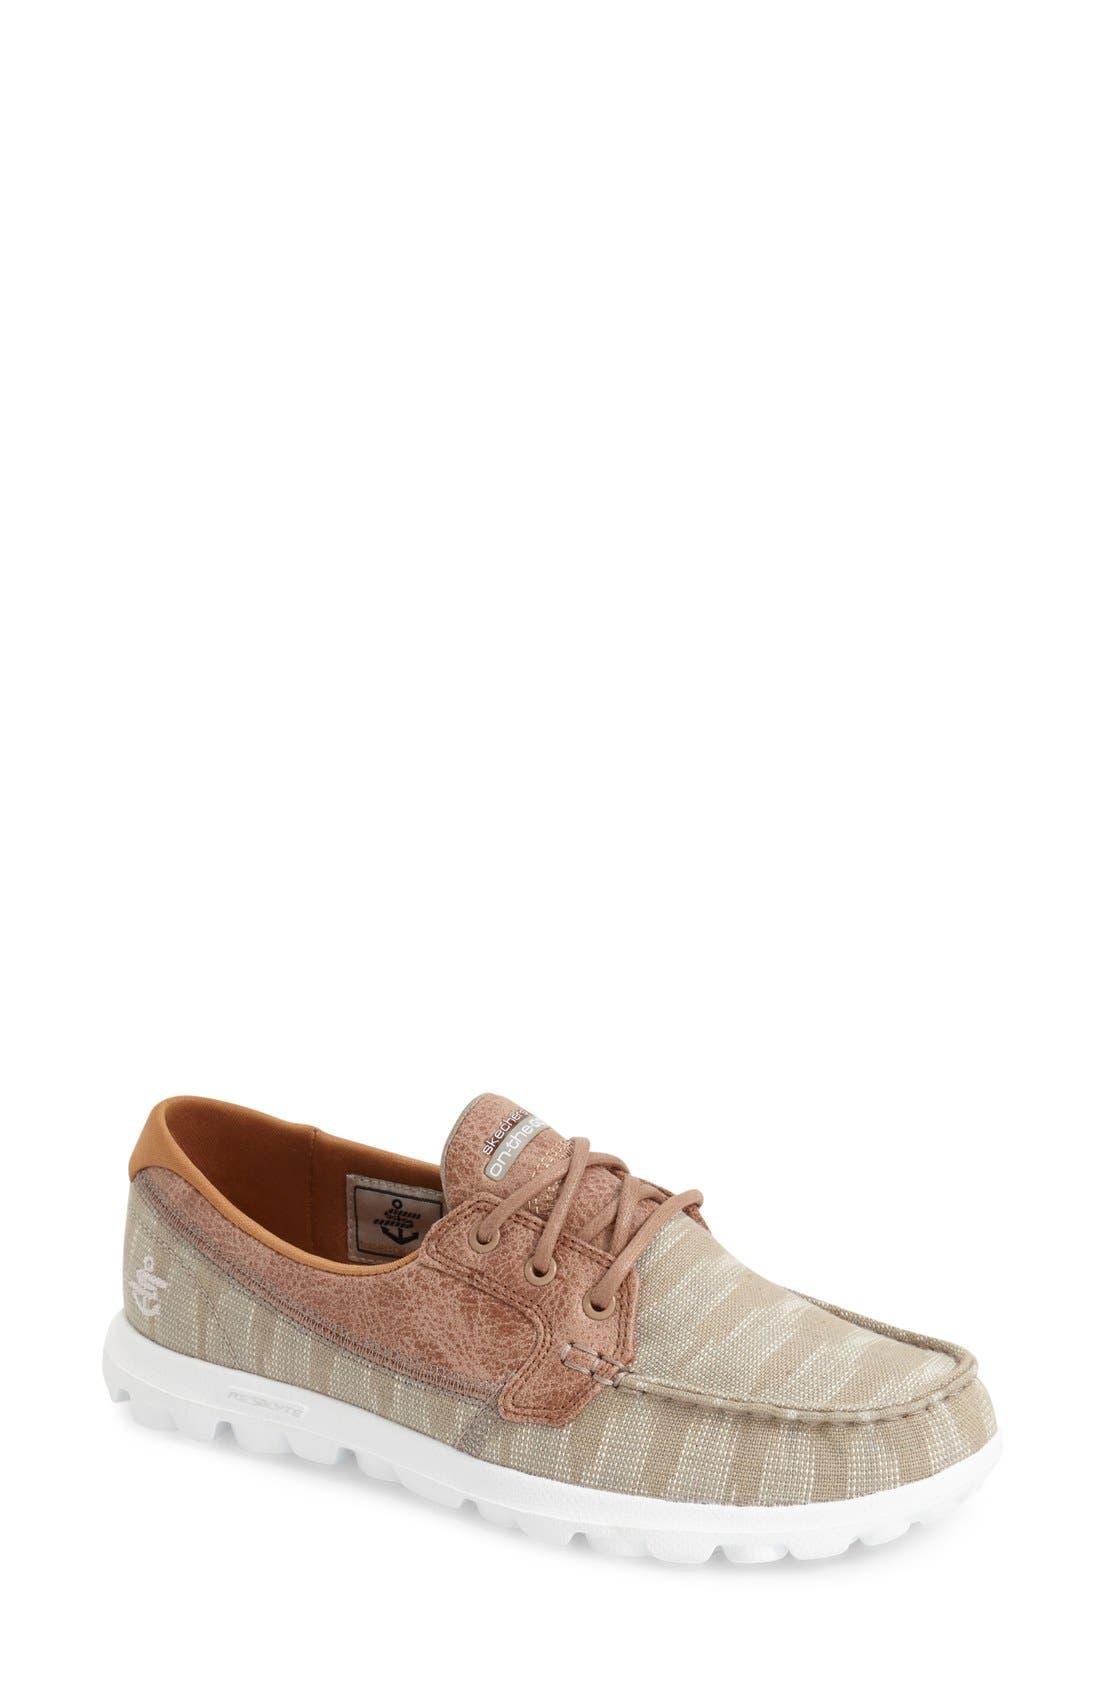 SKECHERS GO STEP' Ikat Print Sneaker (Women)